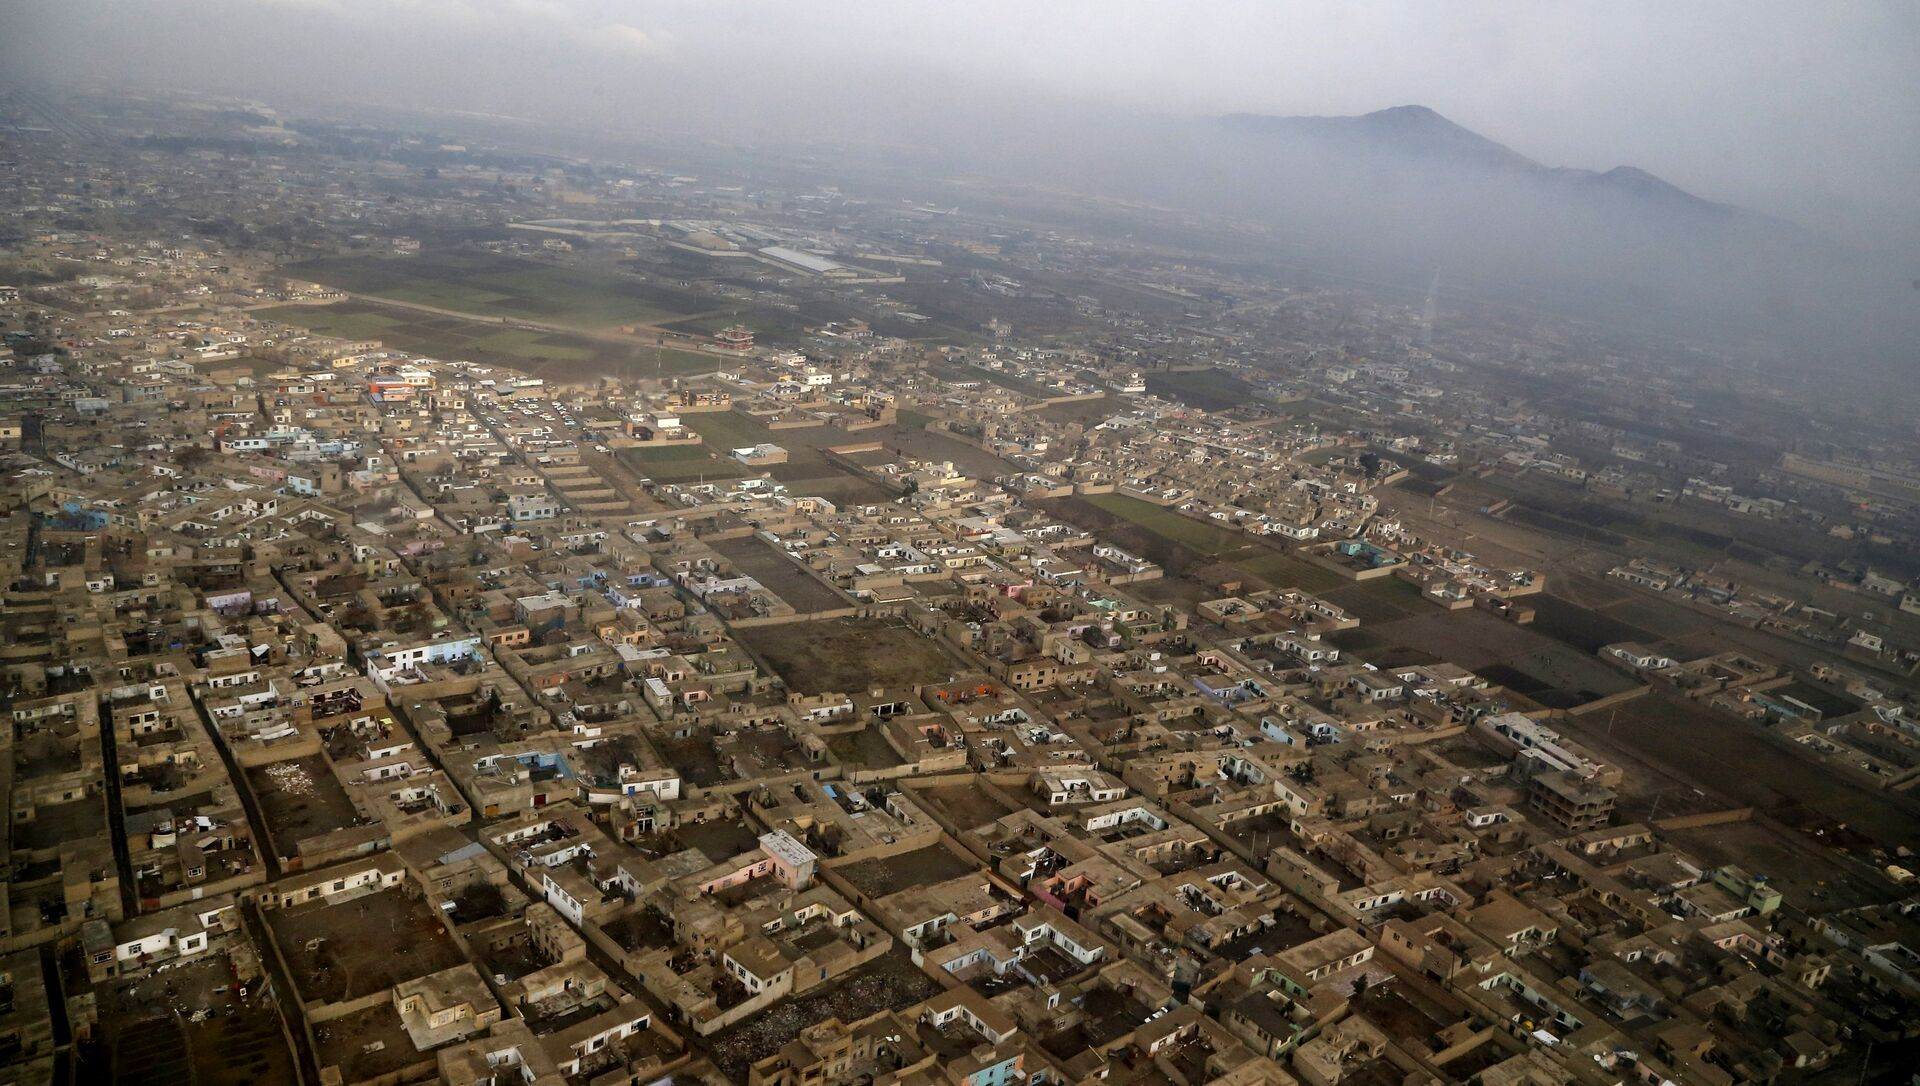 Вид на Кабул, фото из архива - Sputnik Азербайджан, 1920, 17.08.2021